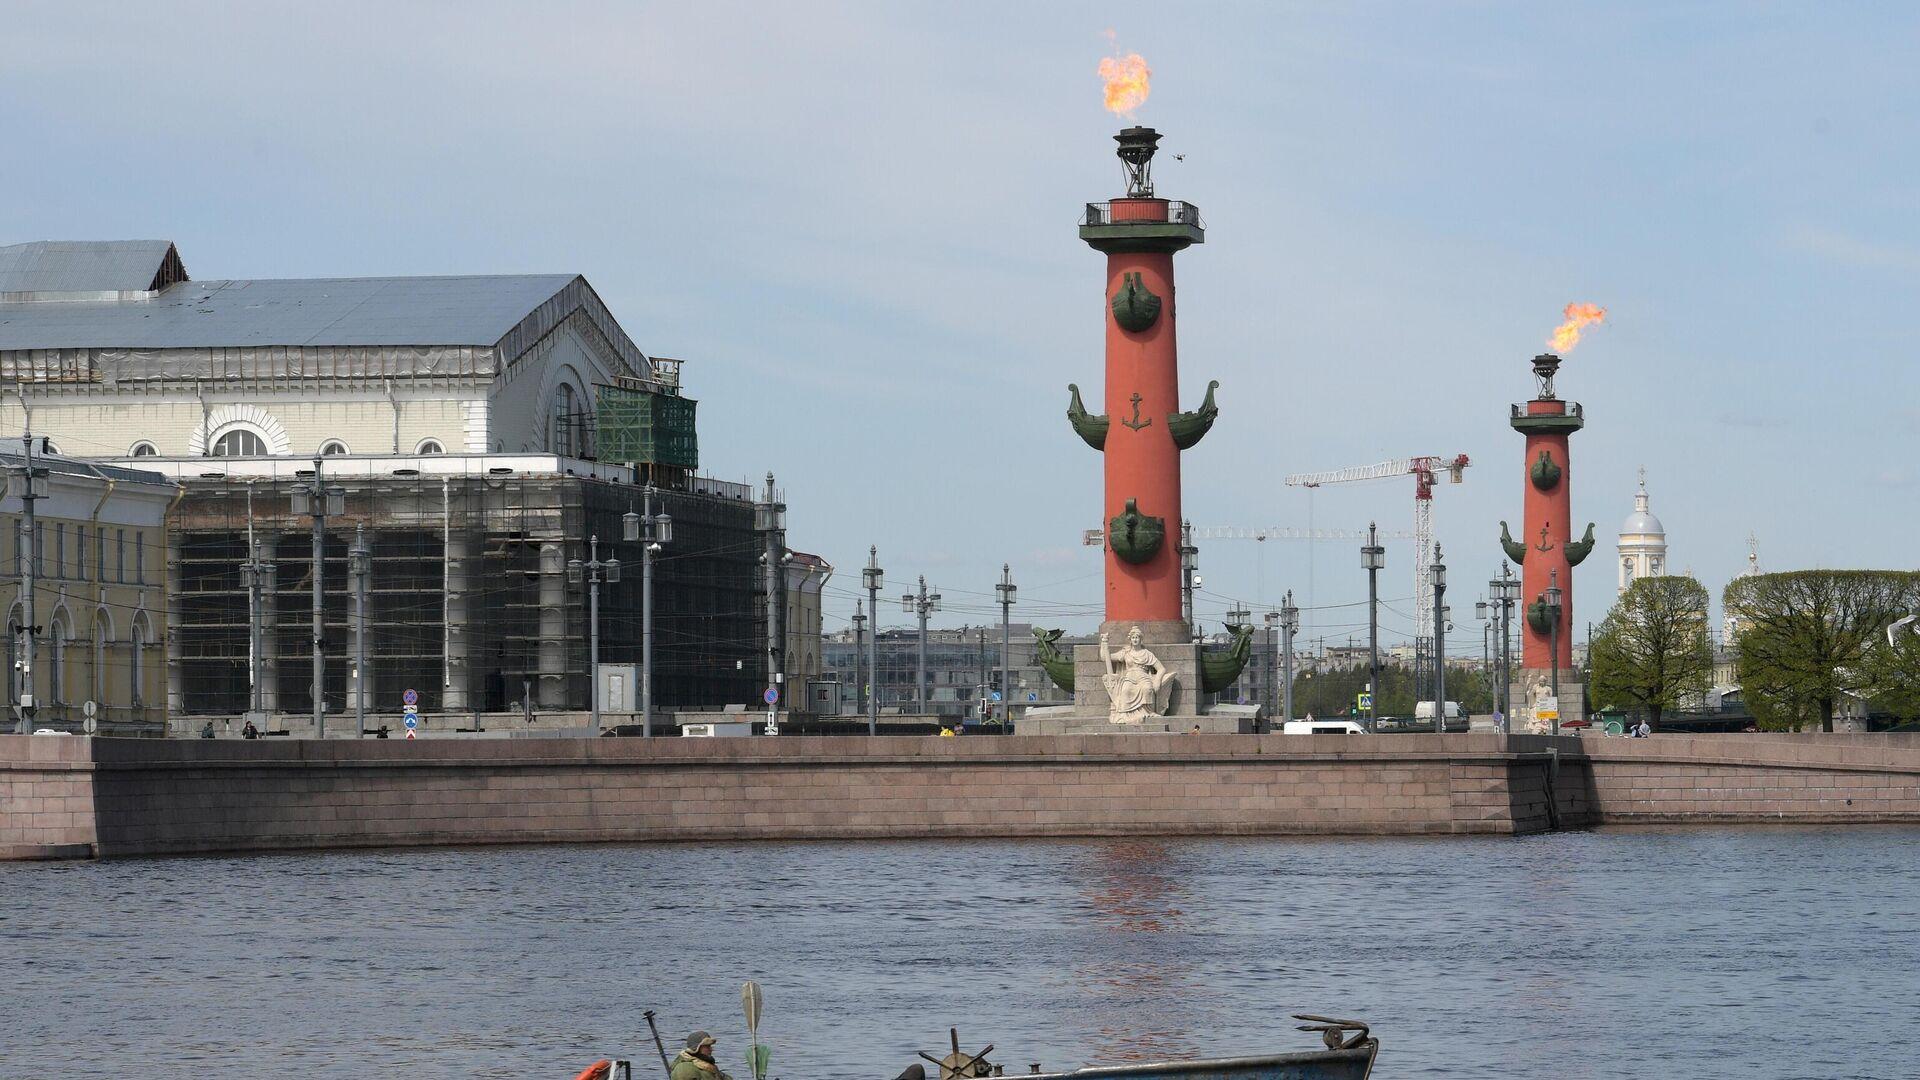 Columnas Rostrales de San Petersburgo - Sputnik Mundo, 1920, 03.05.2021